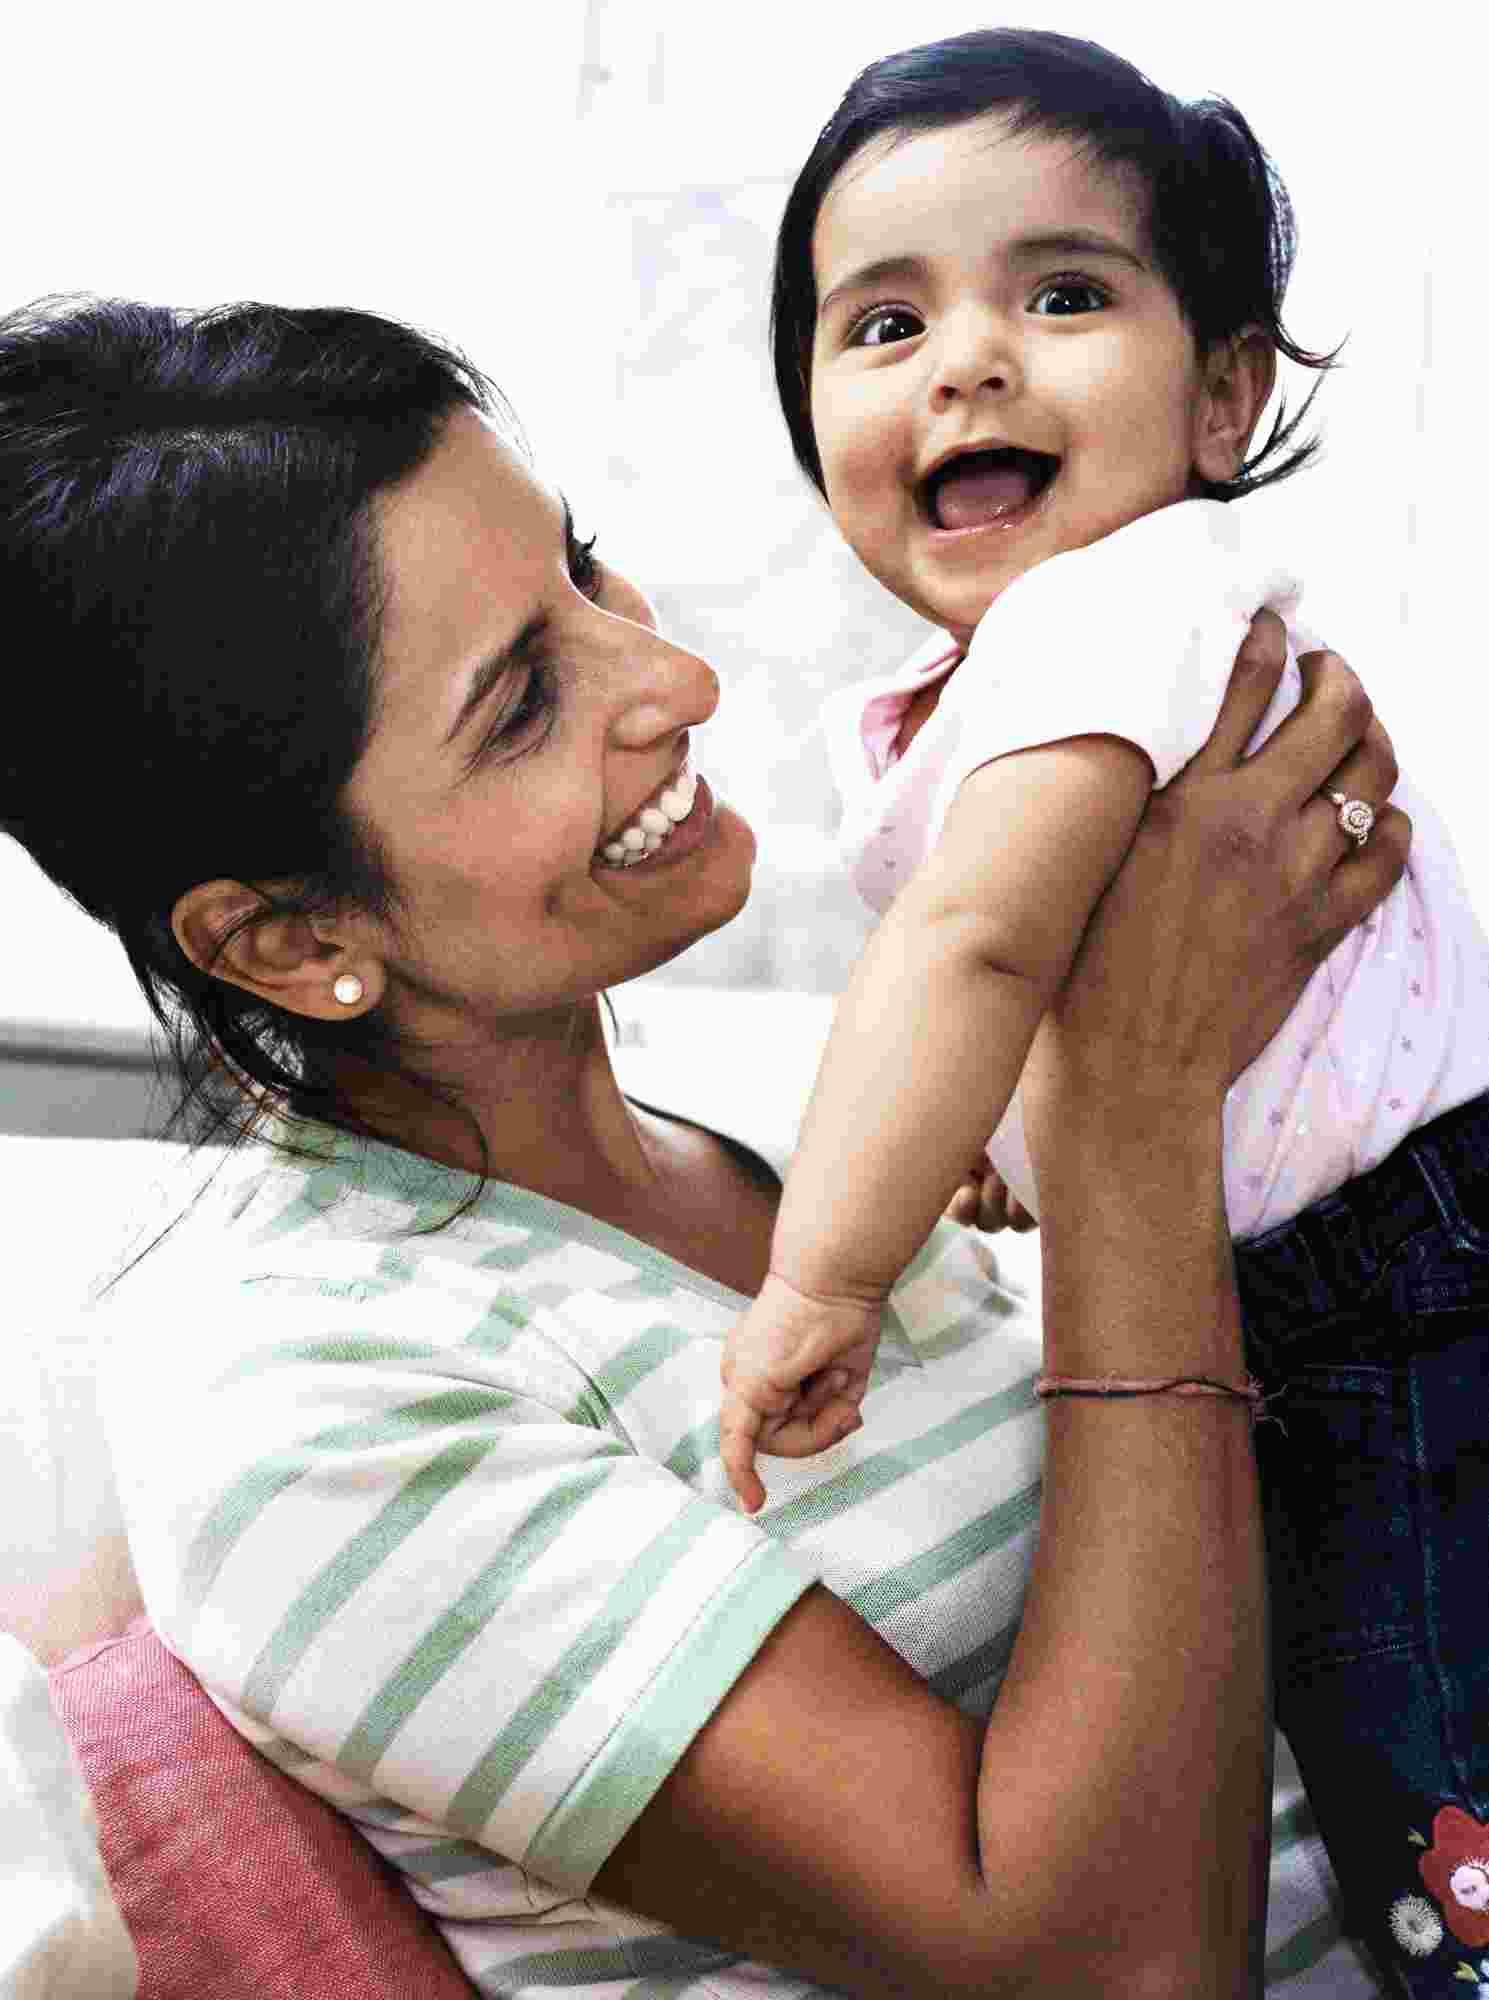 Mommy holding child